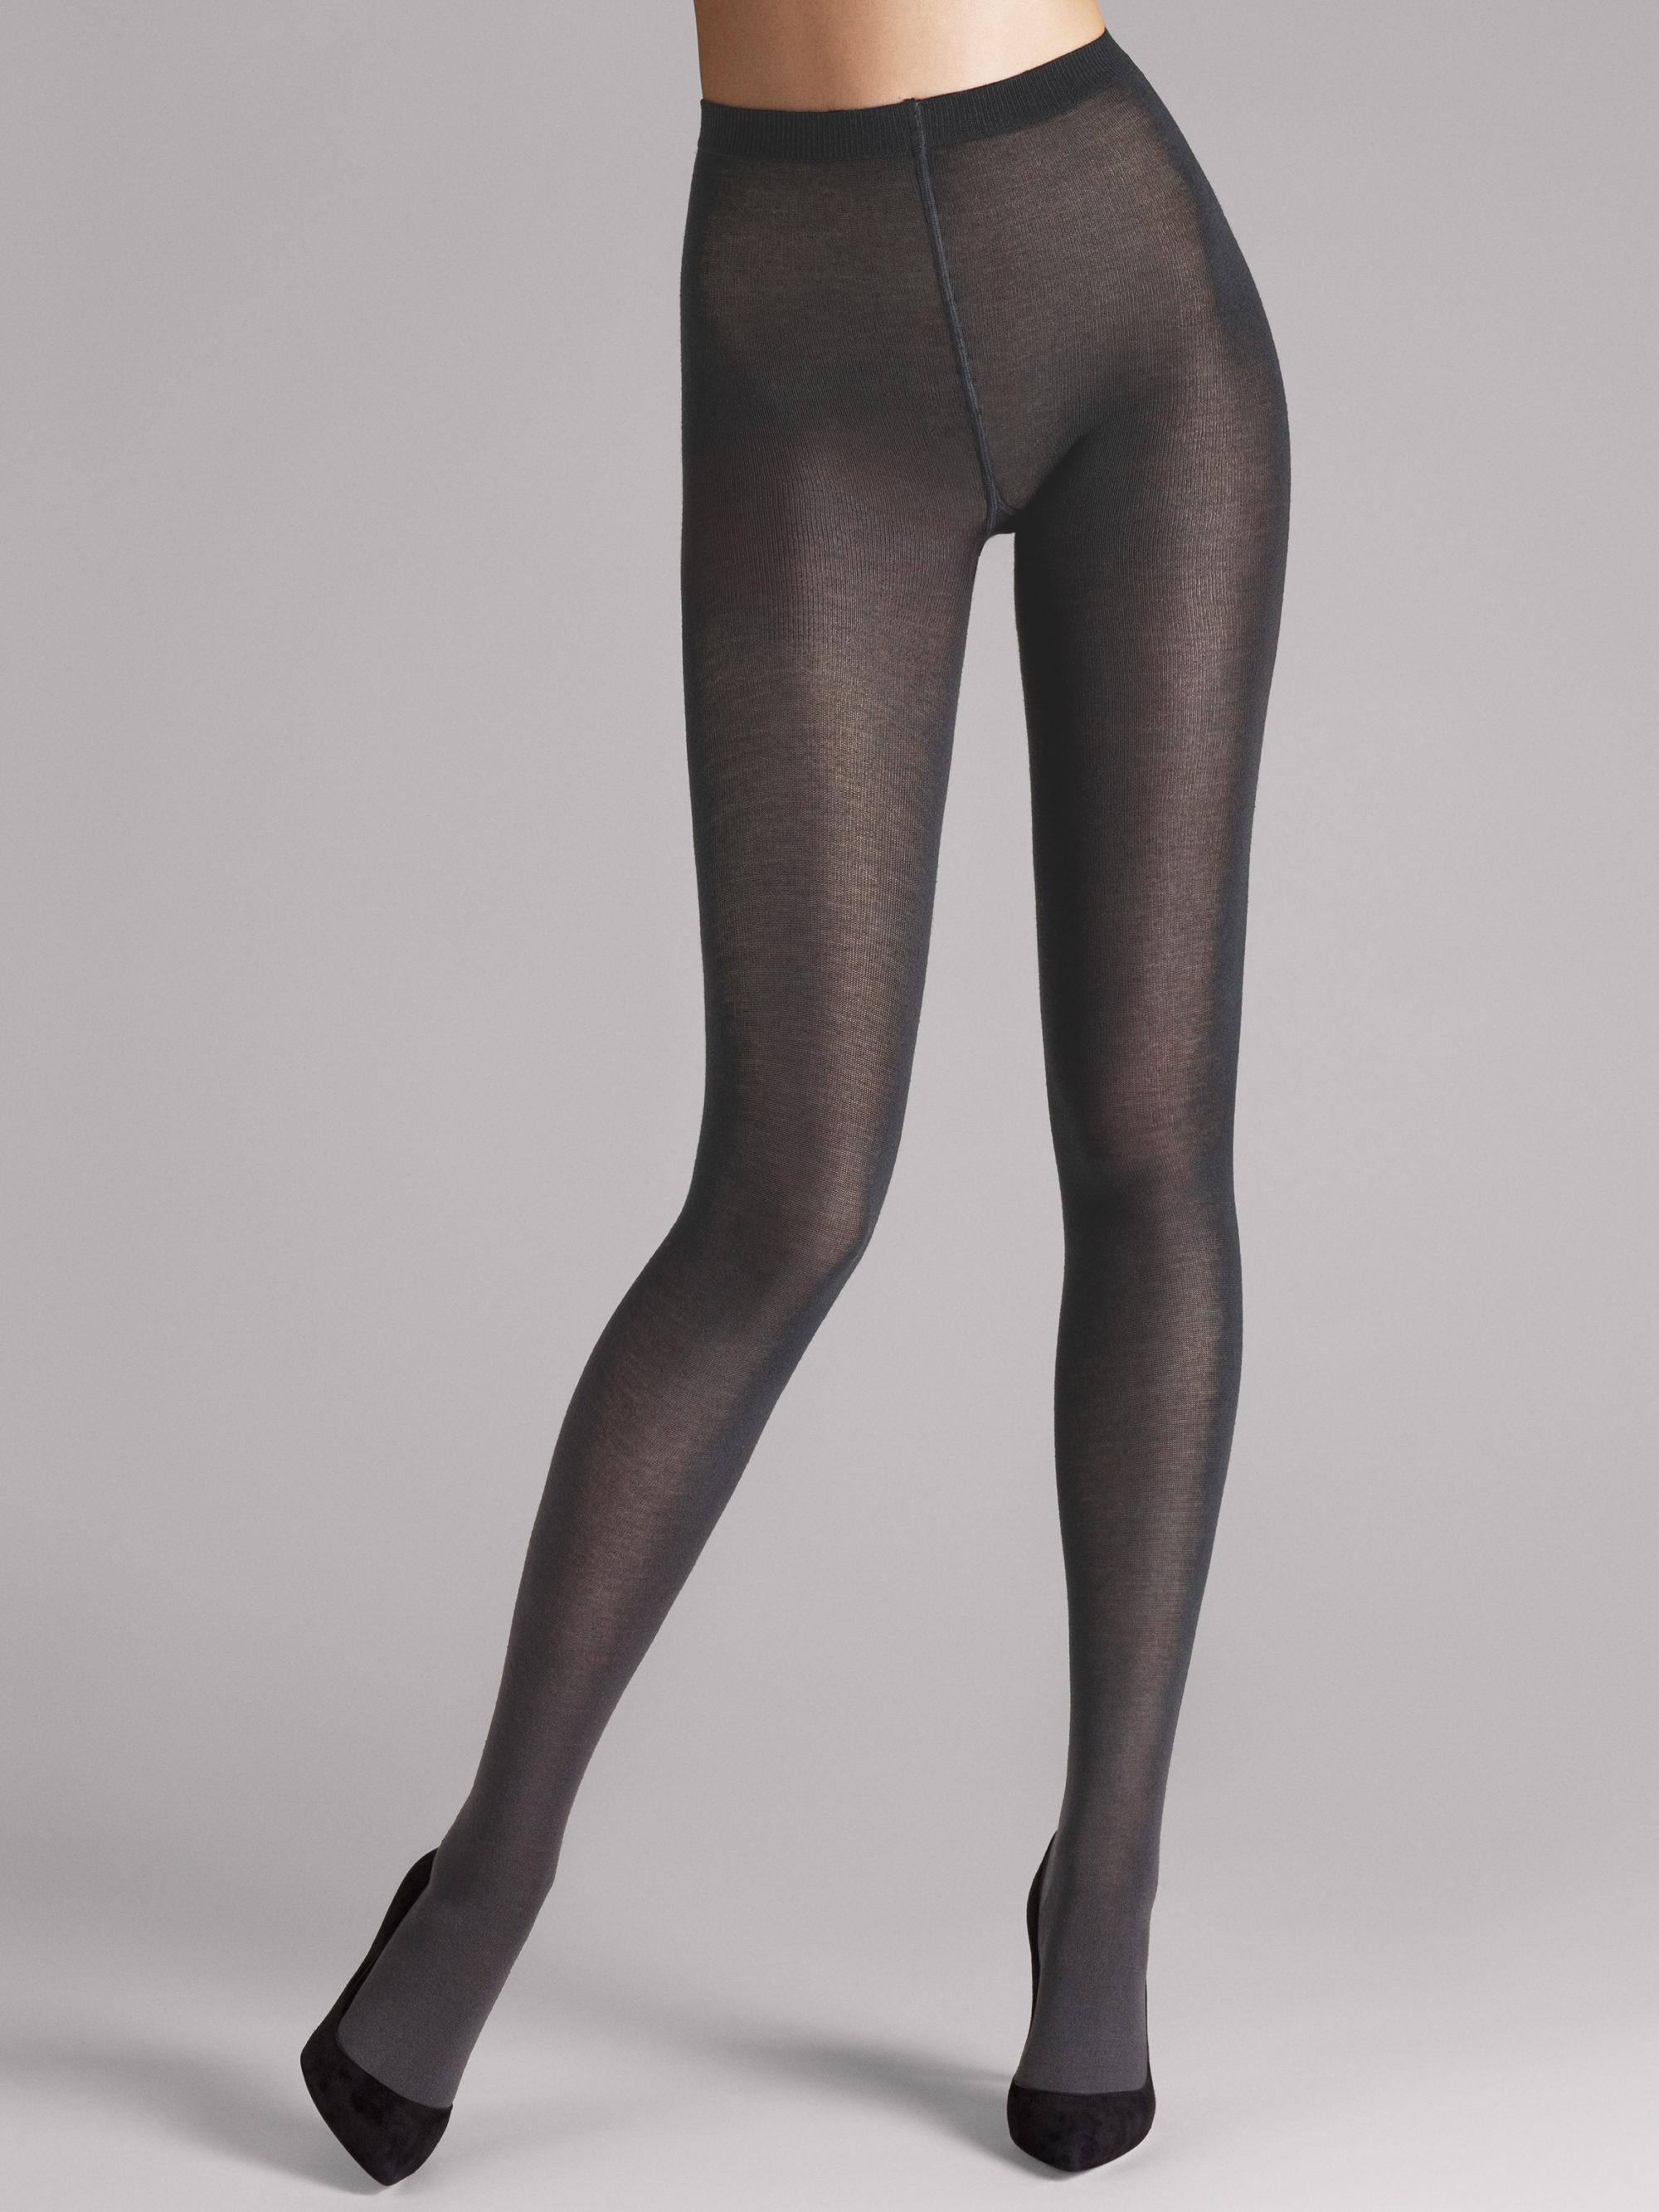 Wolford Merino tights